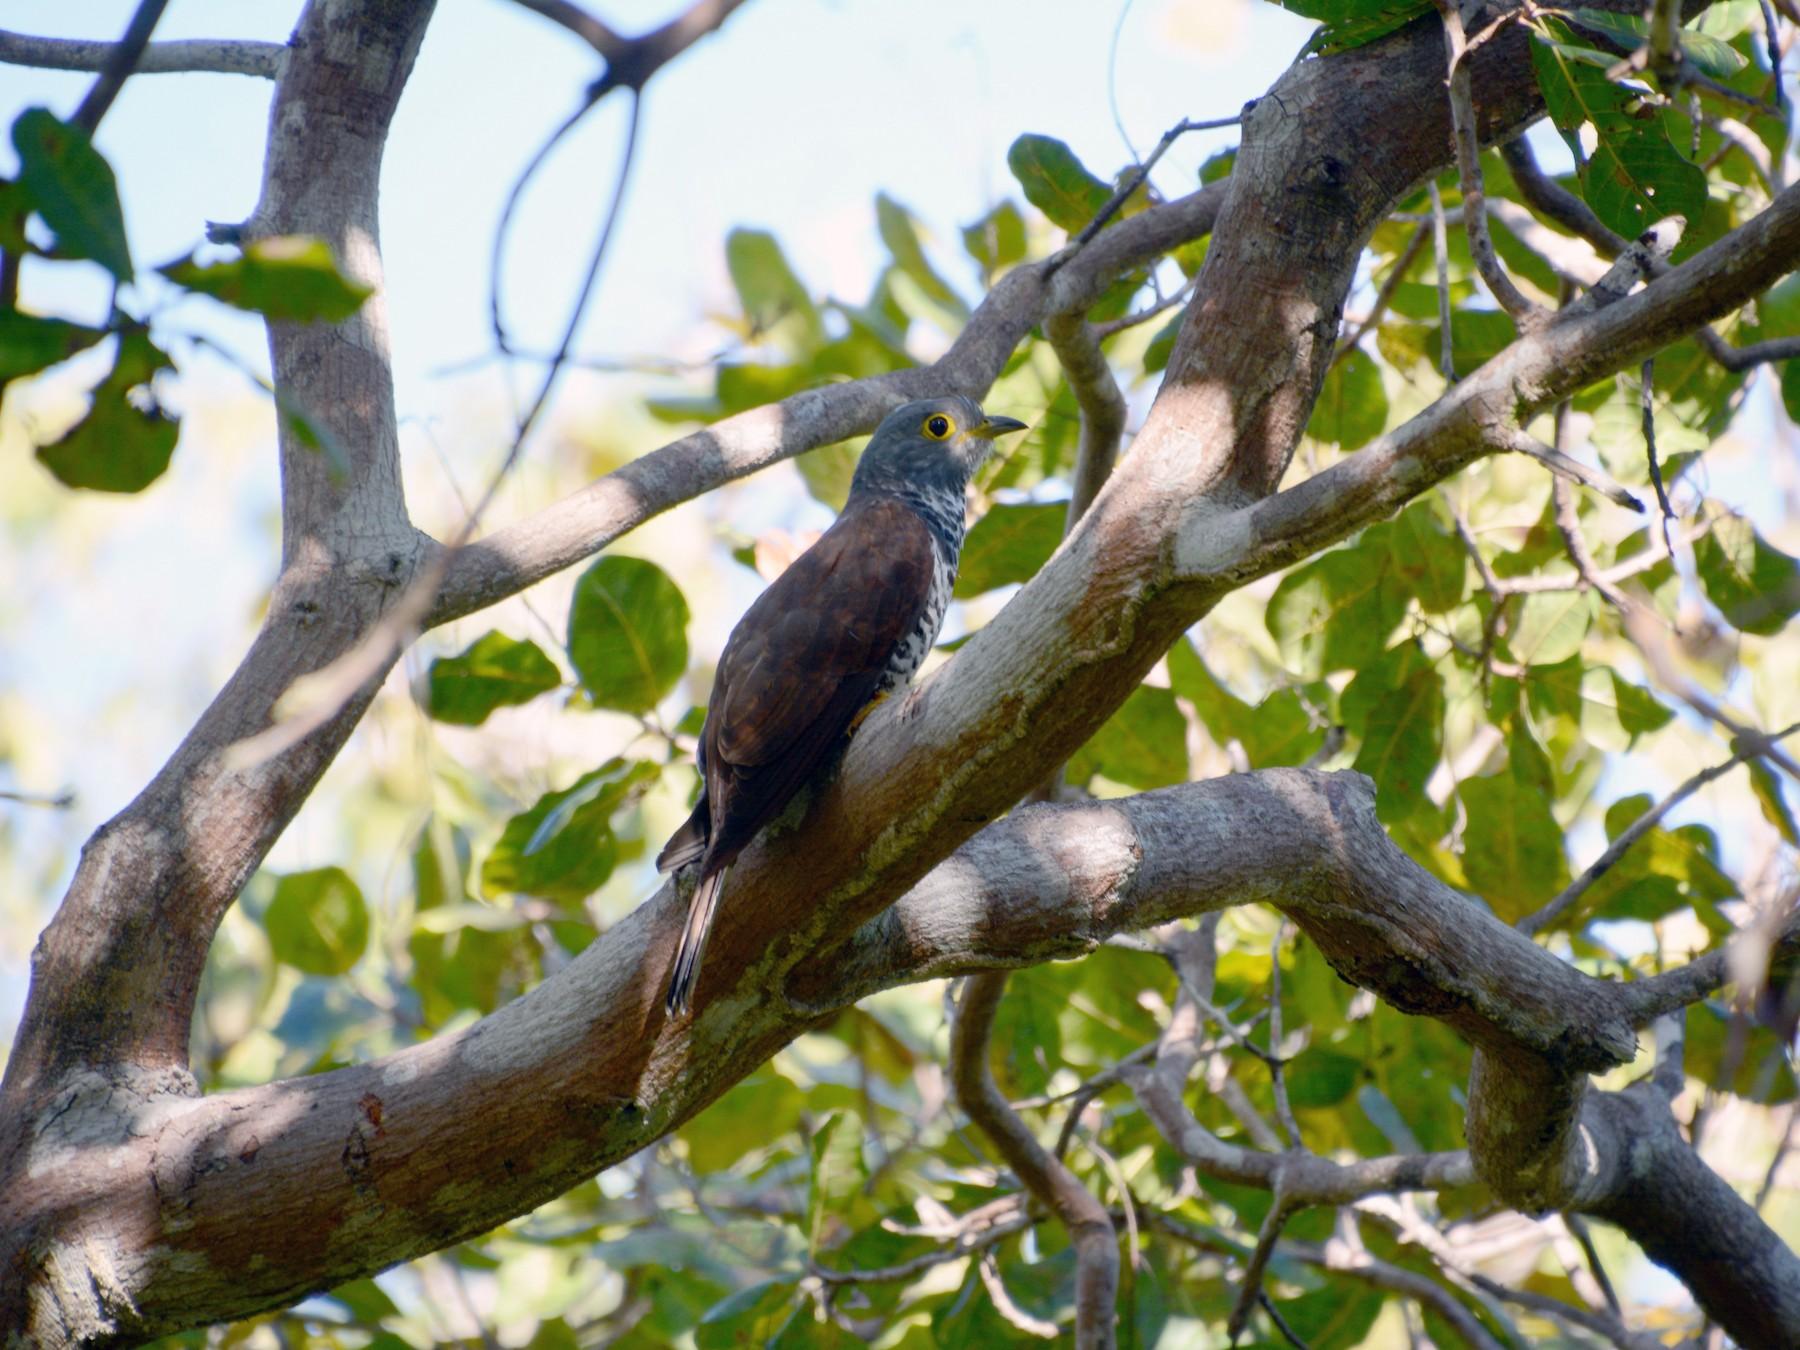 Sulawesi Cuckoo - Opwall Indonesia